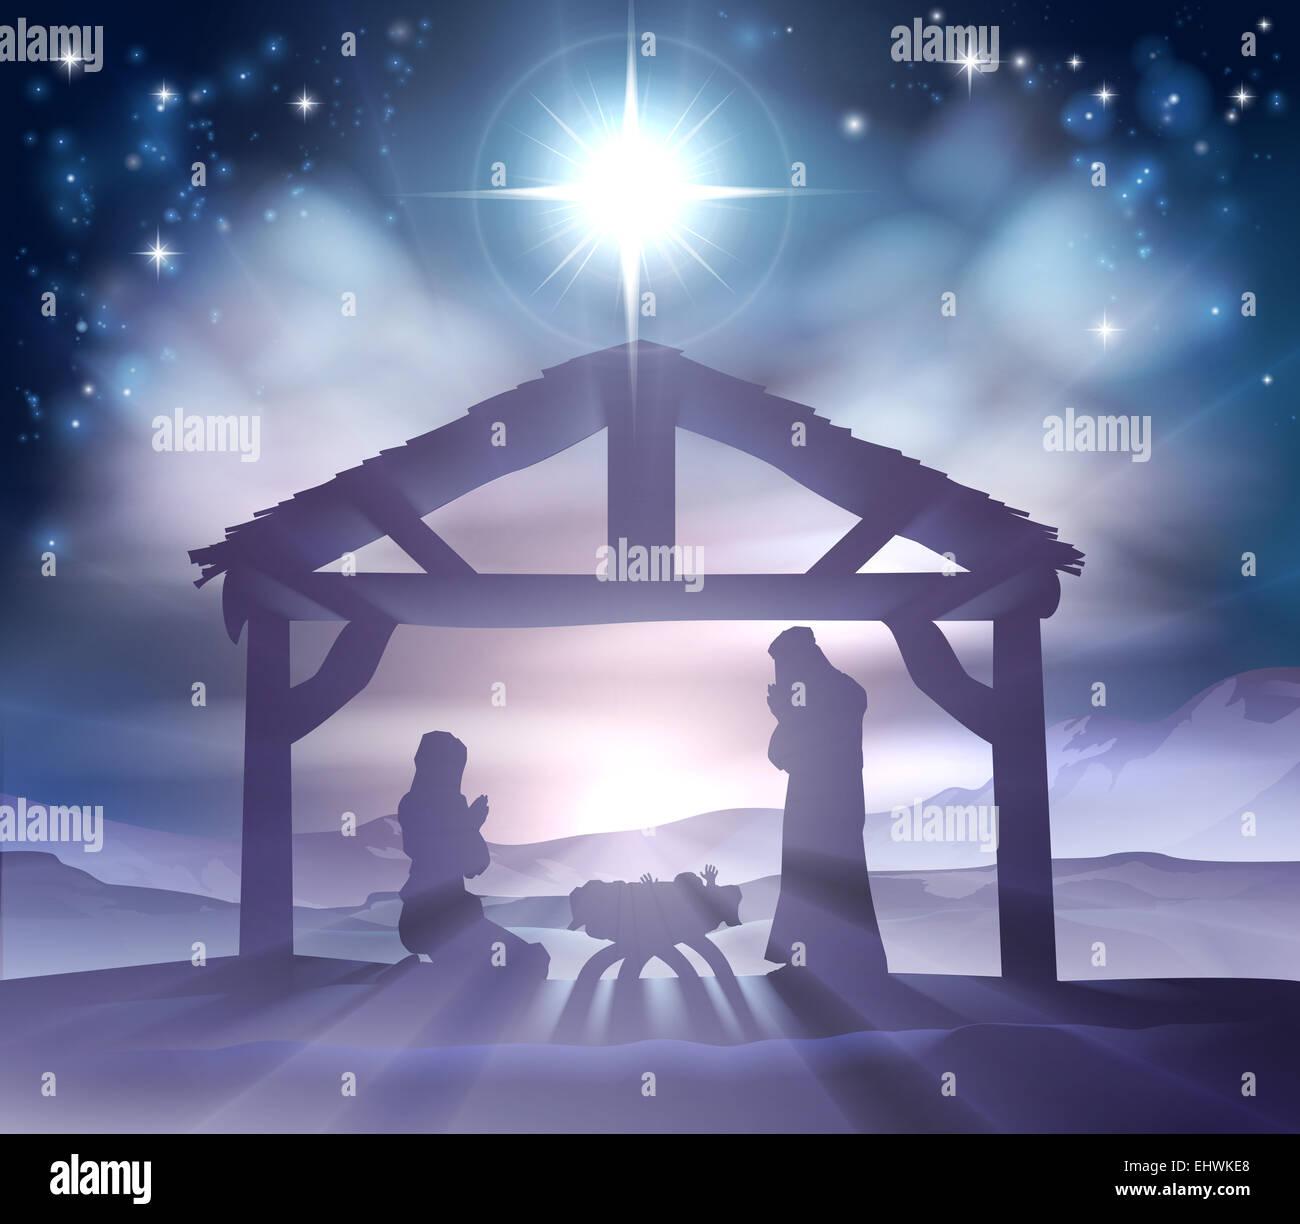 Traditional christian christmas nativity scene of baby jesus in the traditional christian christmas nativity scene of baby jesus in the manger with mary and joseph in silhouette aloadofball Choice Image